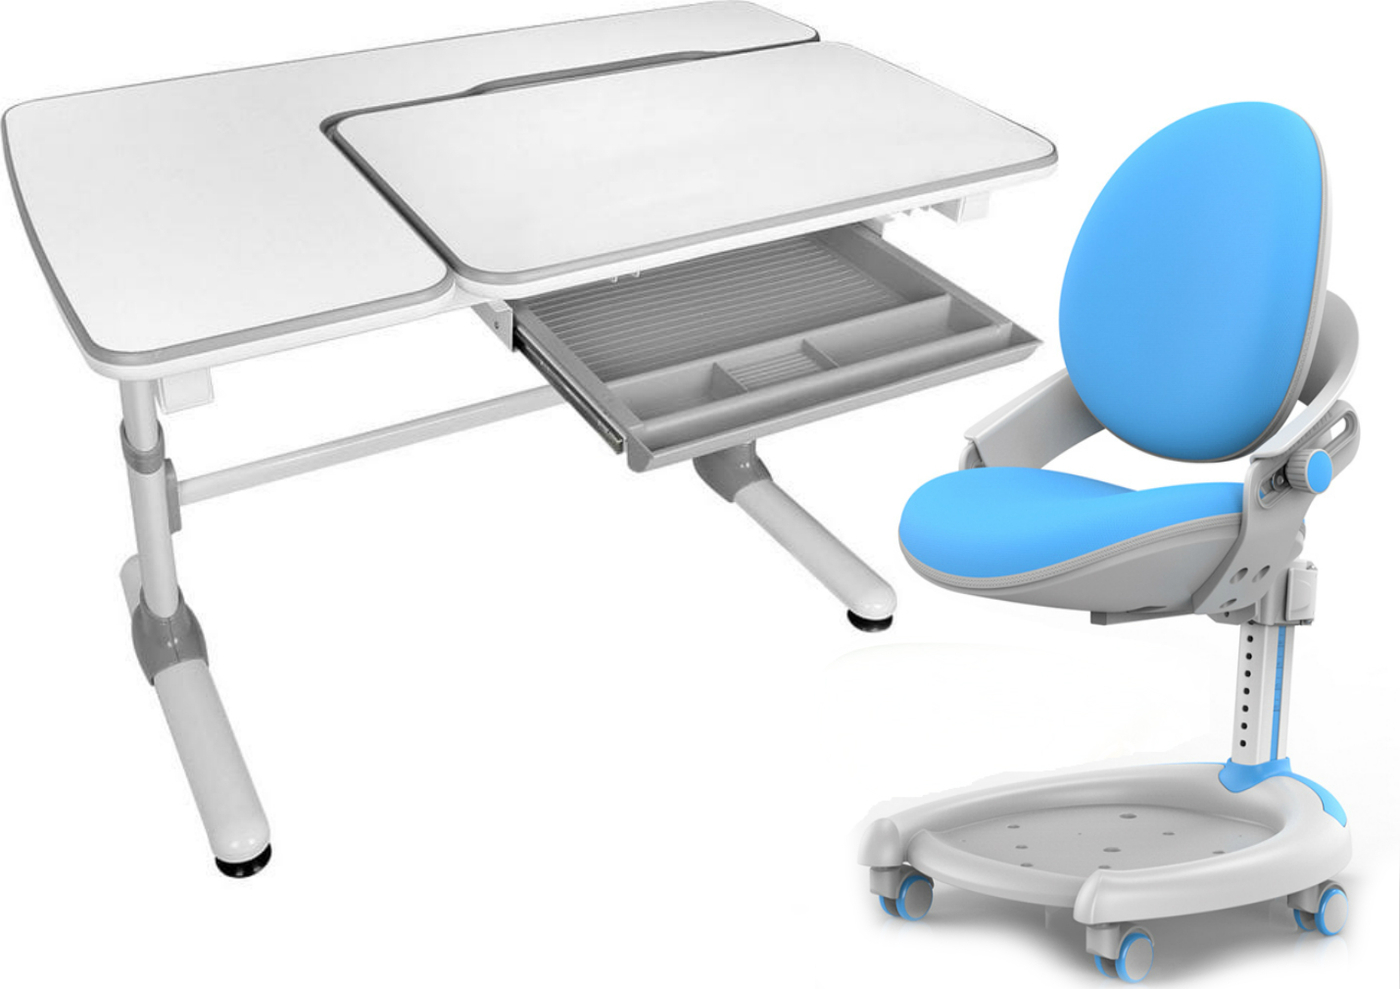 Комплект Mealux Парта Darwin с креслом ZMAX-15 Plus и прозрачной накладкой на парту 65х45